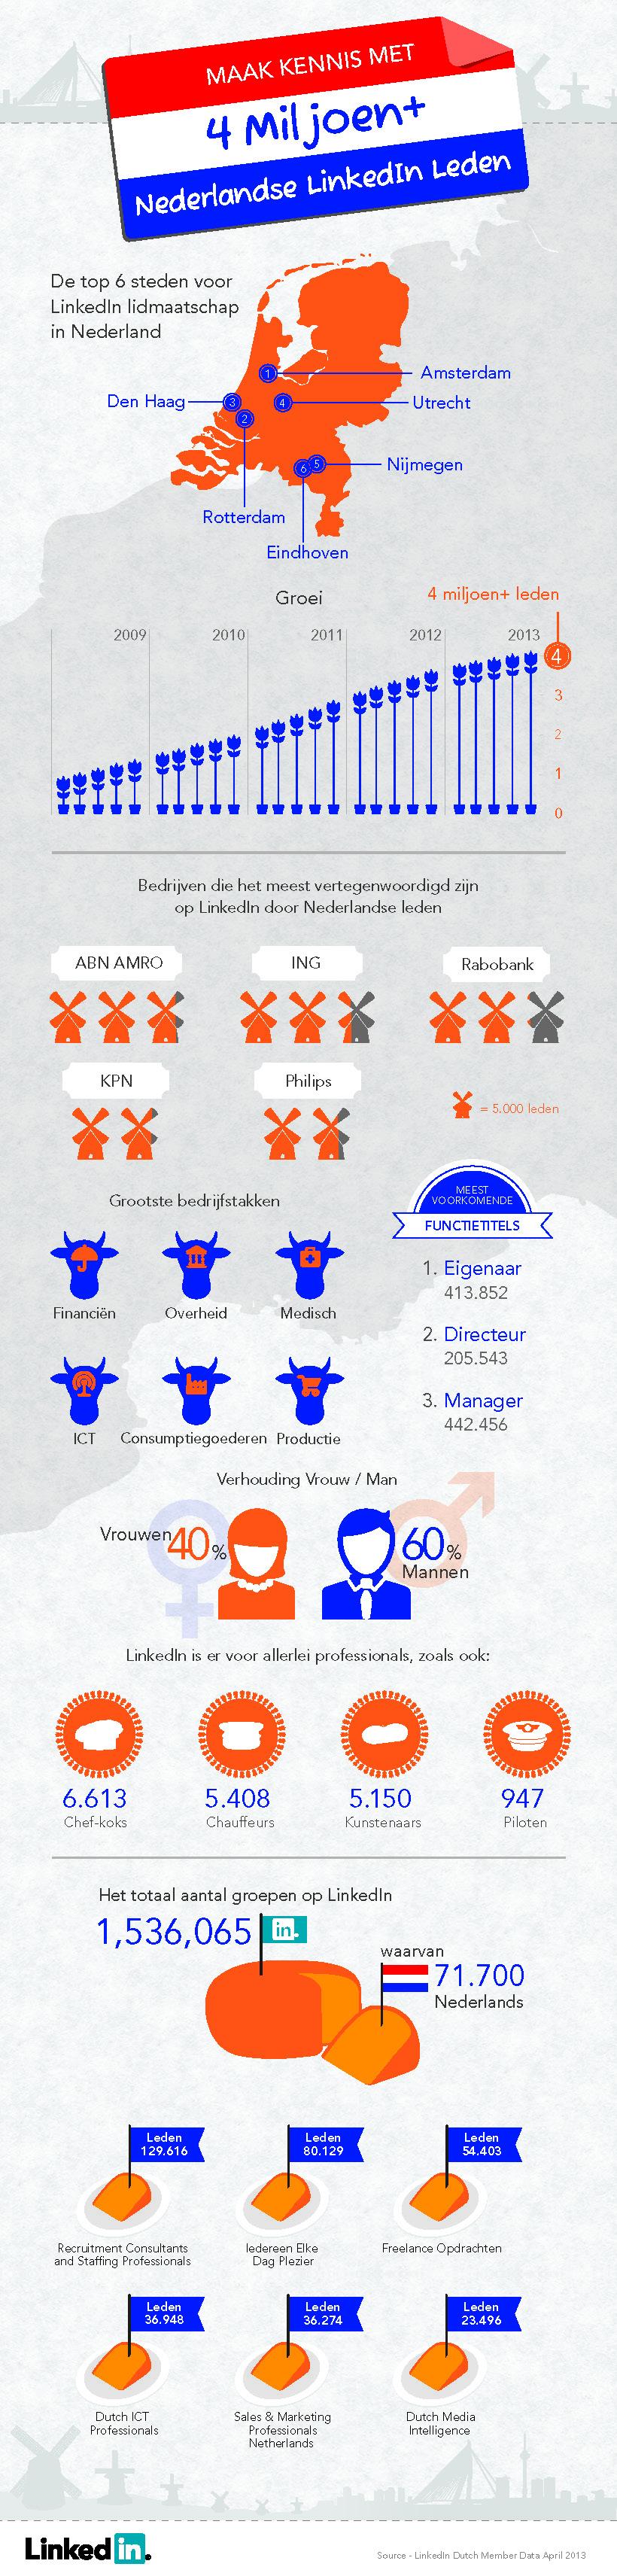 4 Million Members in NL